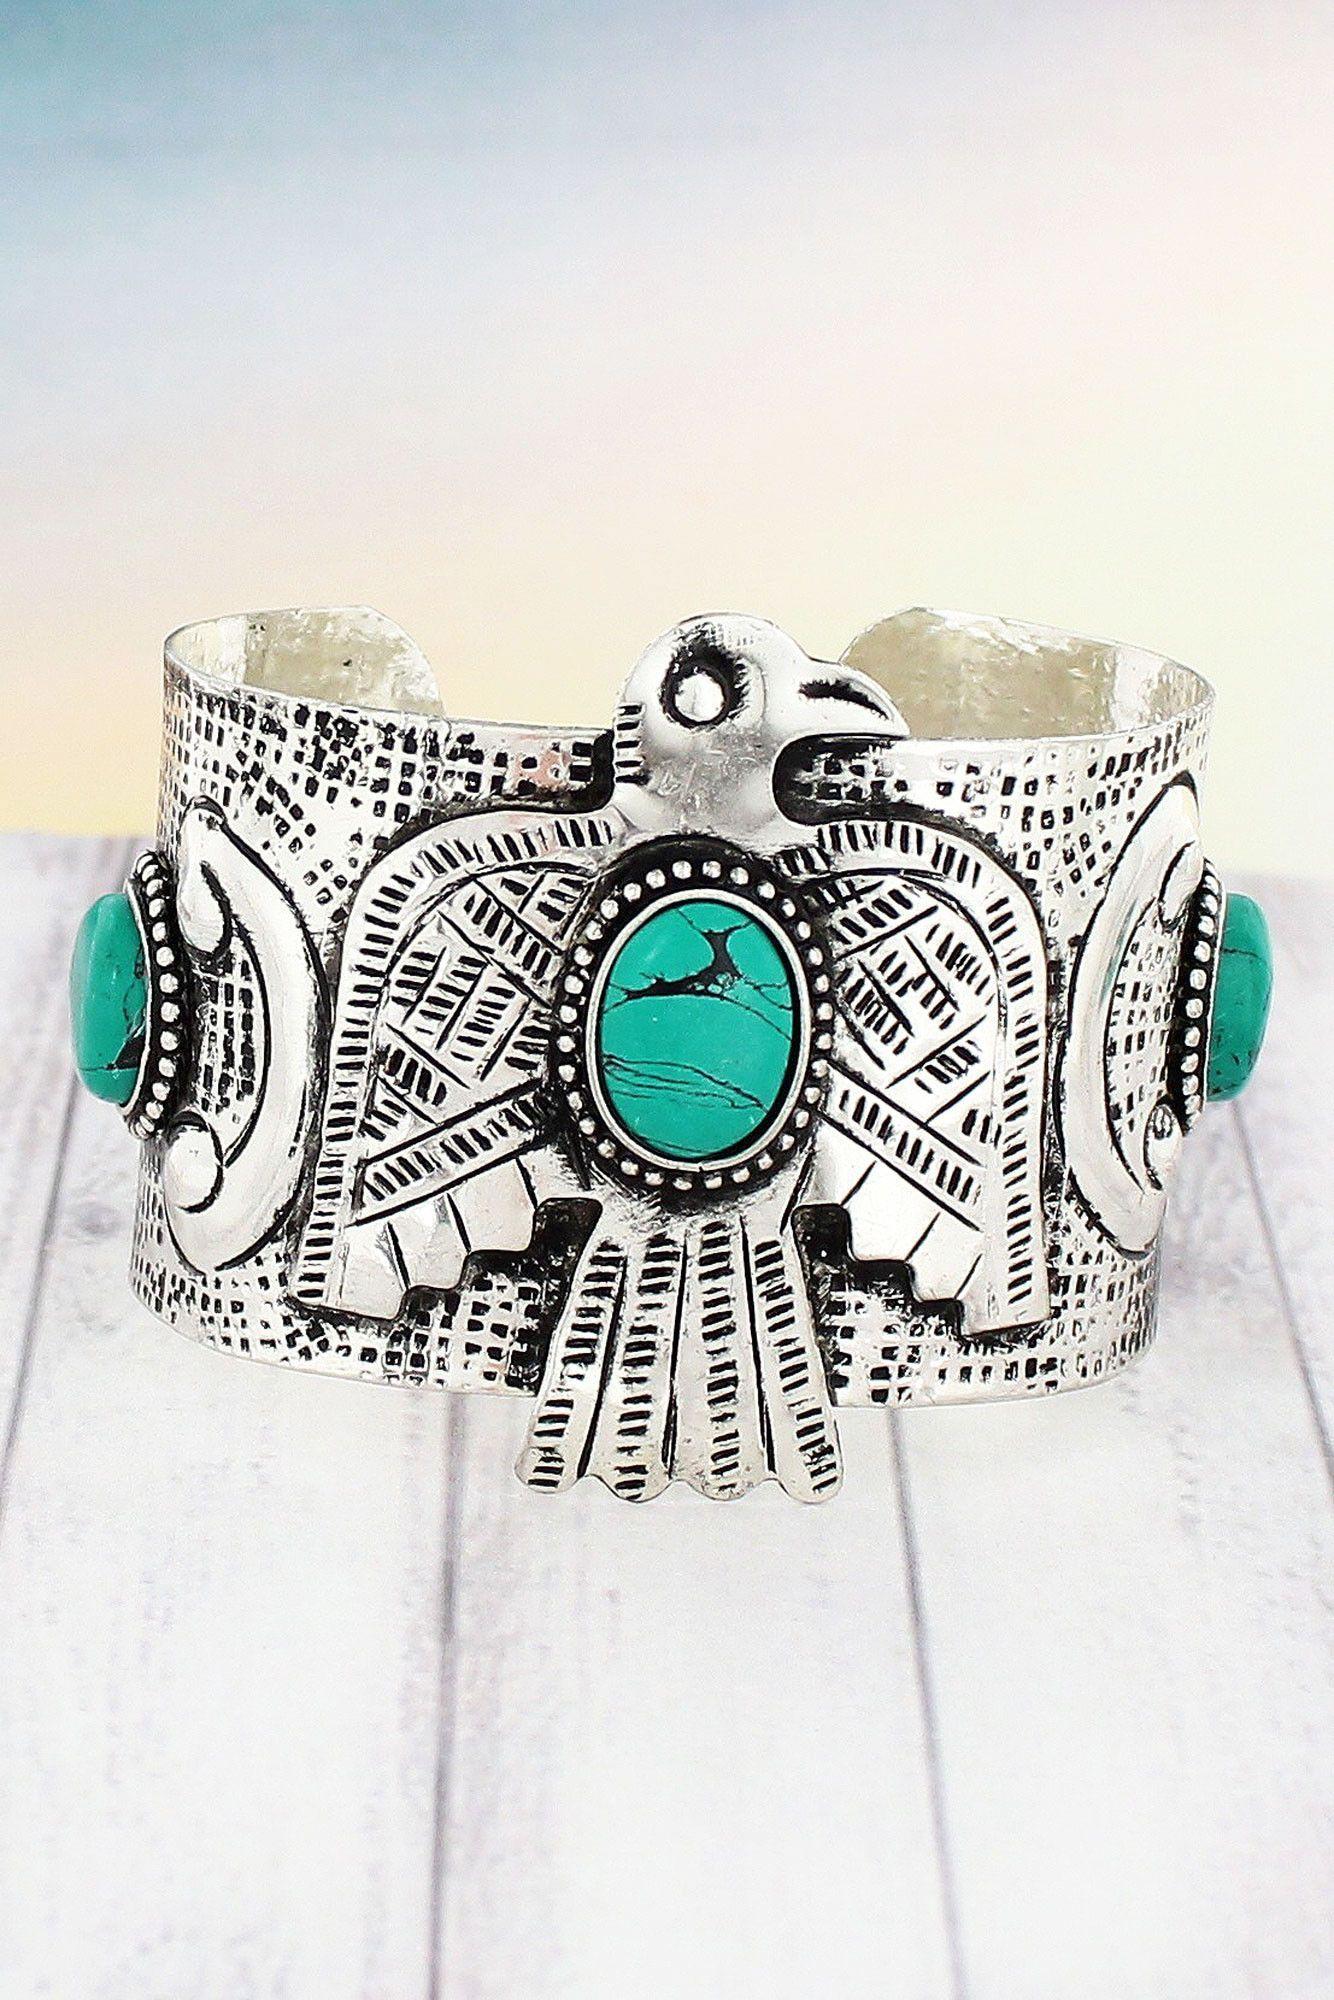 Turquoise Stone Accented Silvertone Thunderbird Cuff Bracelet #SB0010-TQ